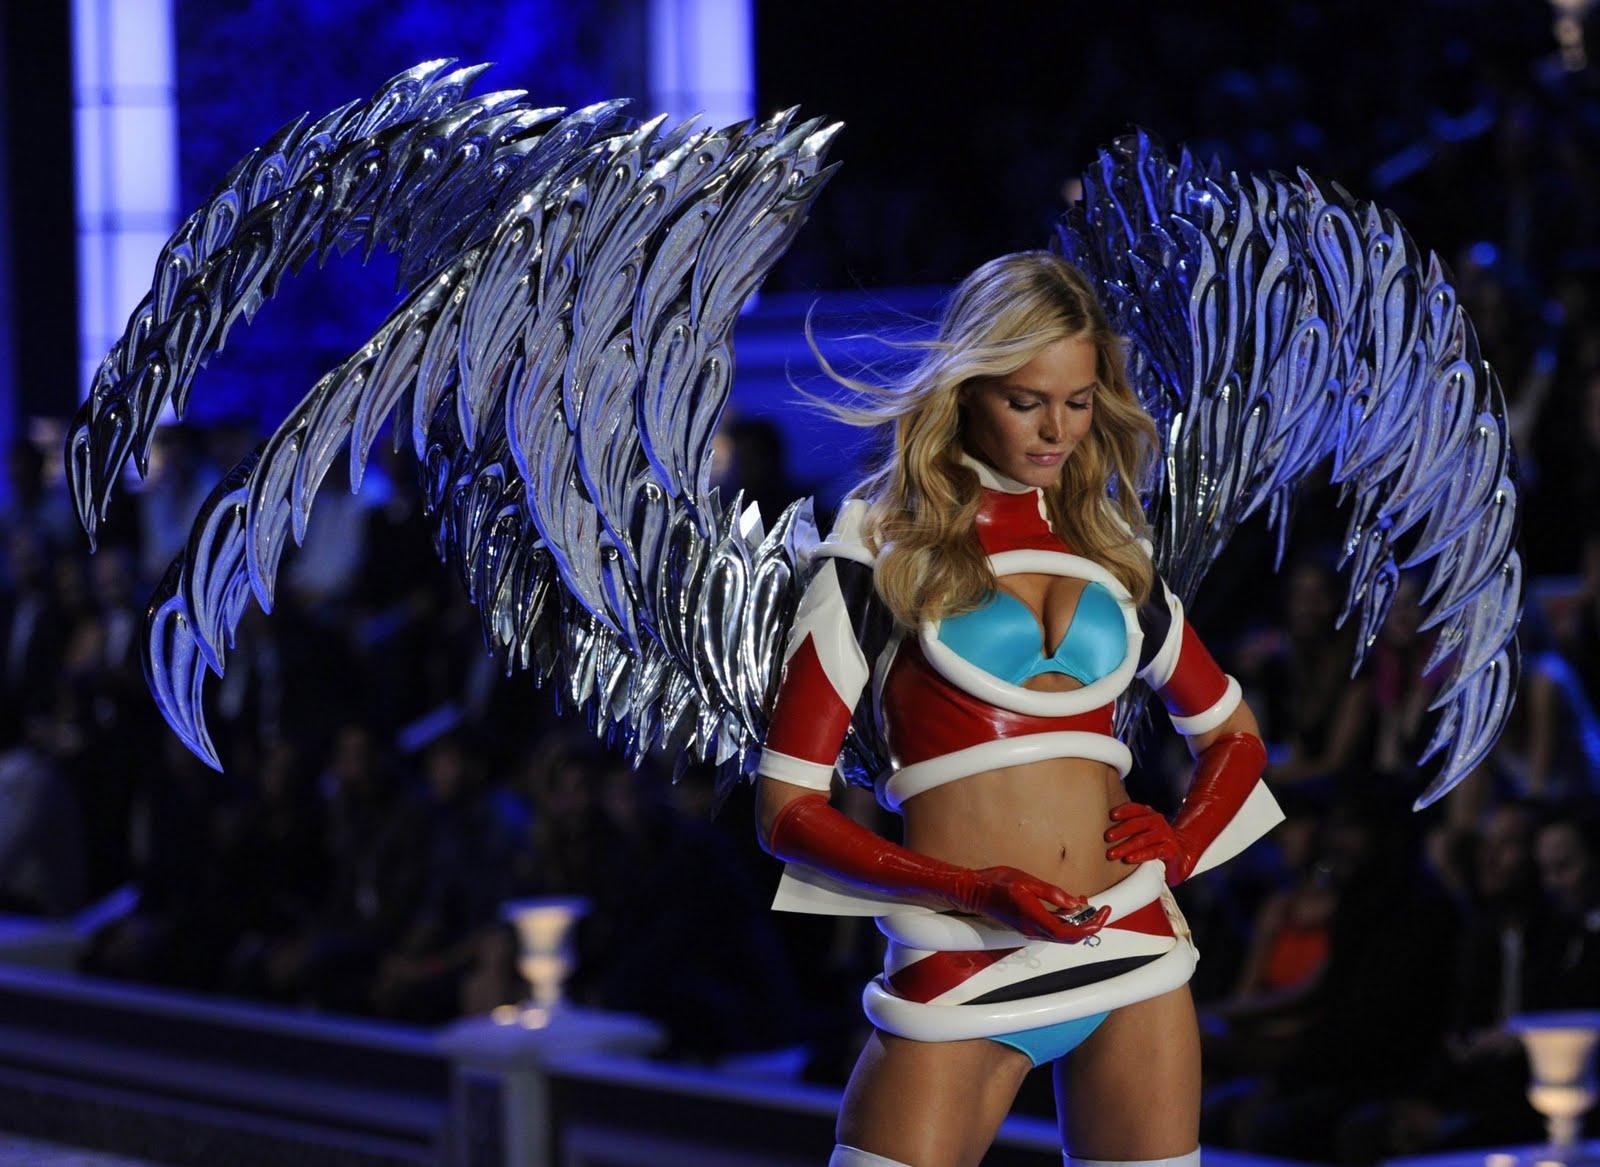 http://4.bp.blogspot.com/-9xYGjbYYc9s/UCFE8PpxVeI/AAAAAAAAA4Q/Cug8fPs5bgo/s1600/Erin+Heatherton+-+Victorias+Secret+Fashion+Show+2011-07.jpg